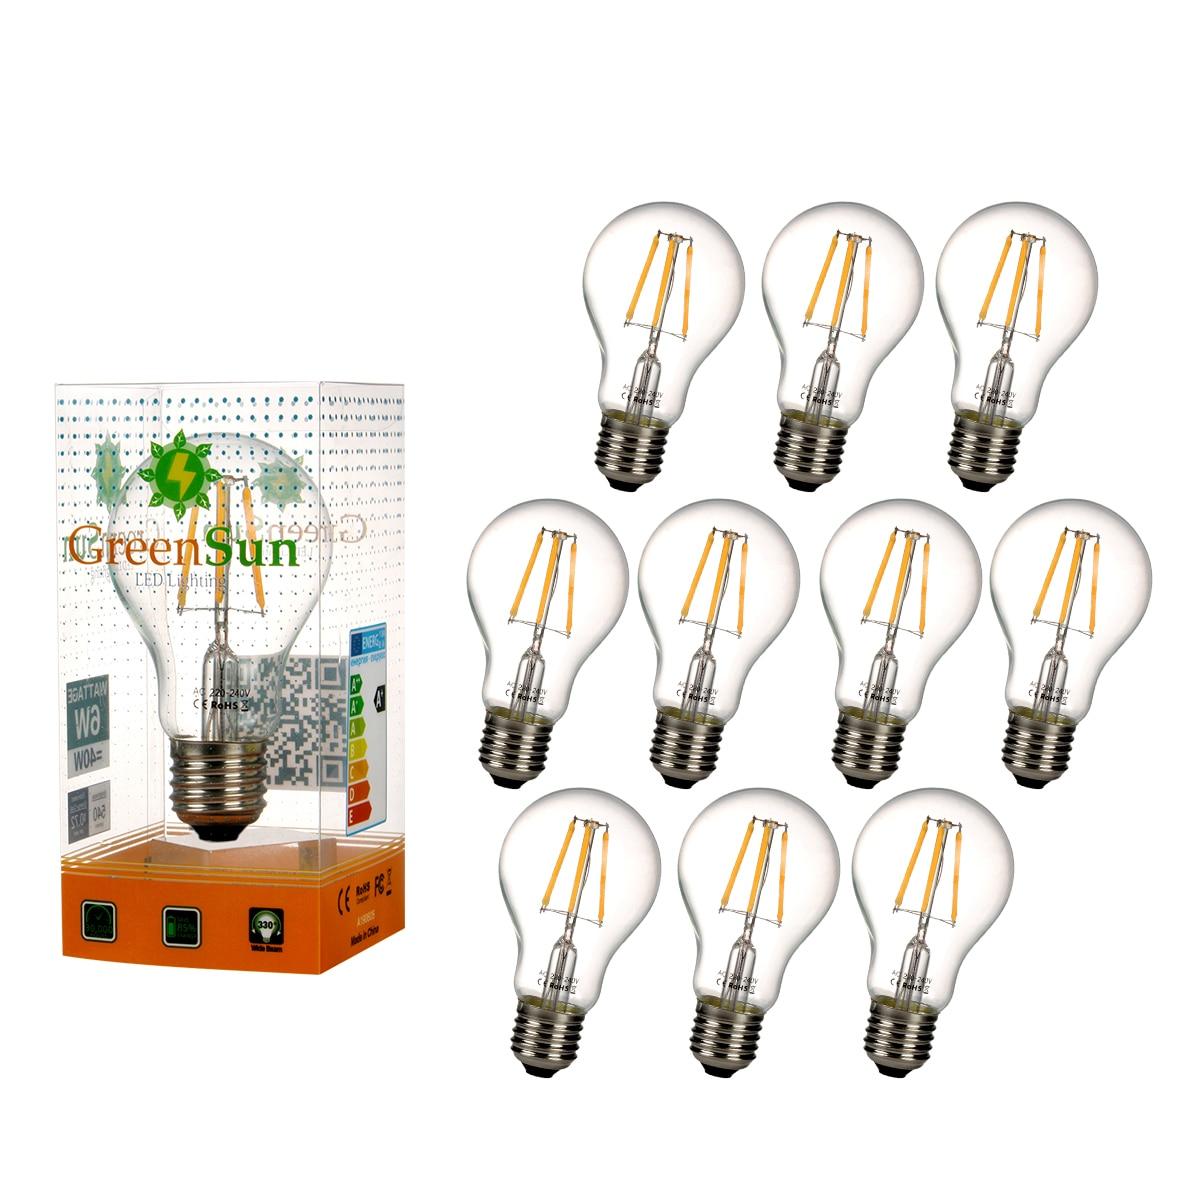 10Pcs E27 6W Edison Filament Warm White LED Energy Saving Bulb Light Lamp smart bulb e27 7w led bulb energy saving lamp color changeable smart bulb led lighting for iphone android home bedroom lighitng